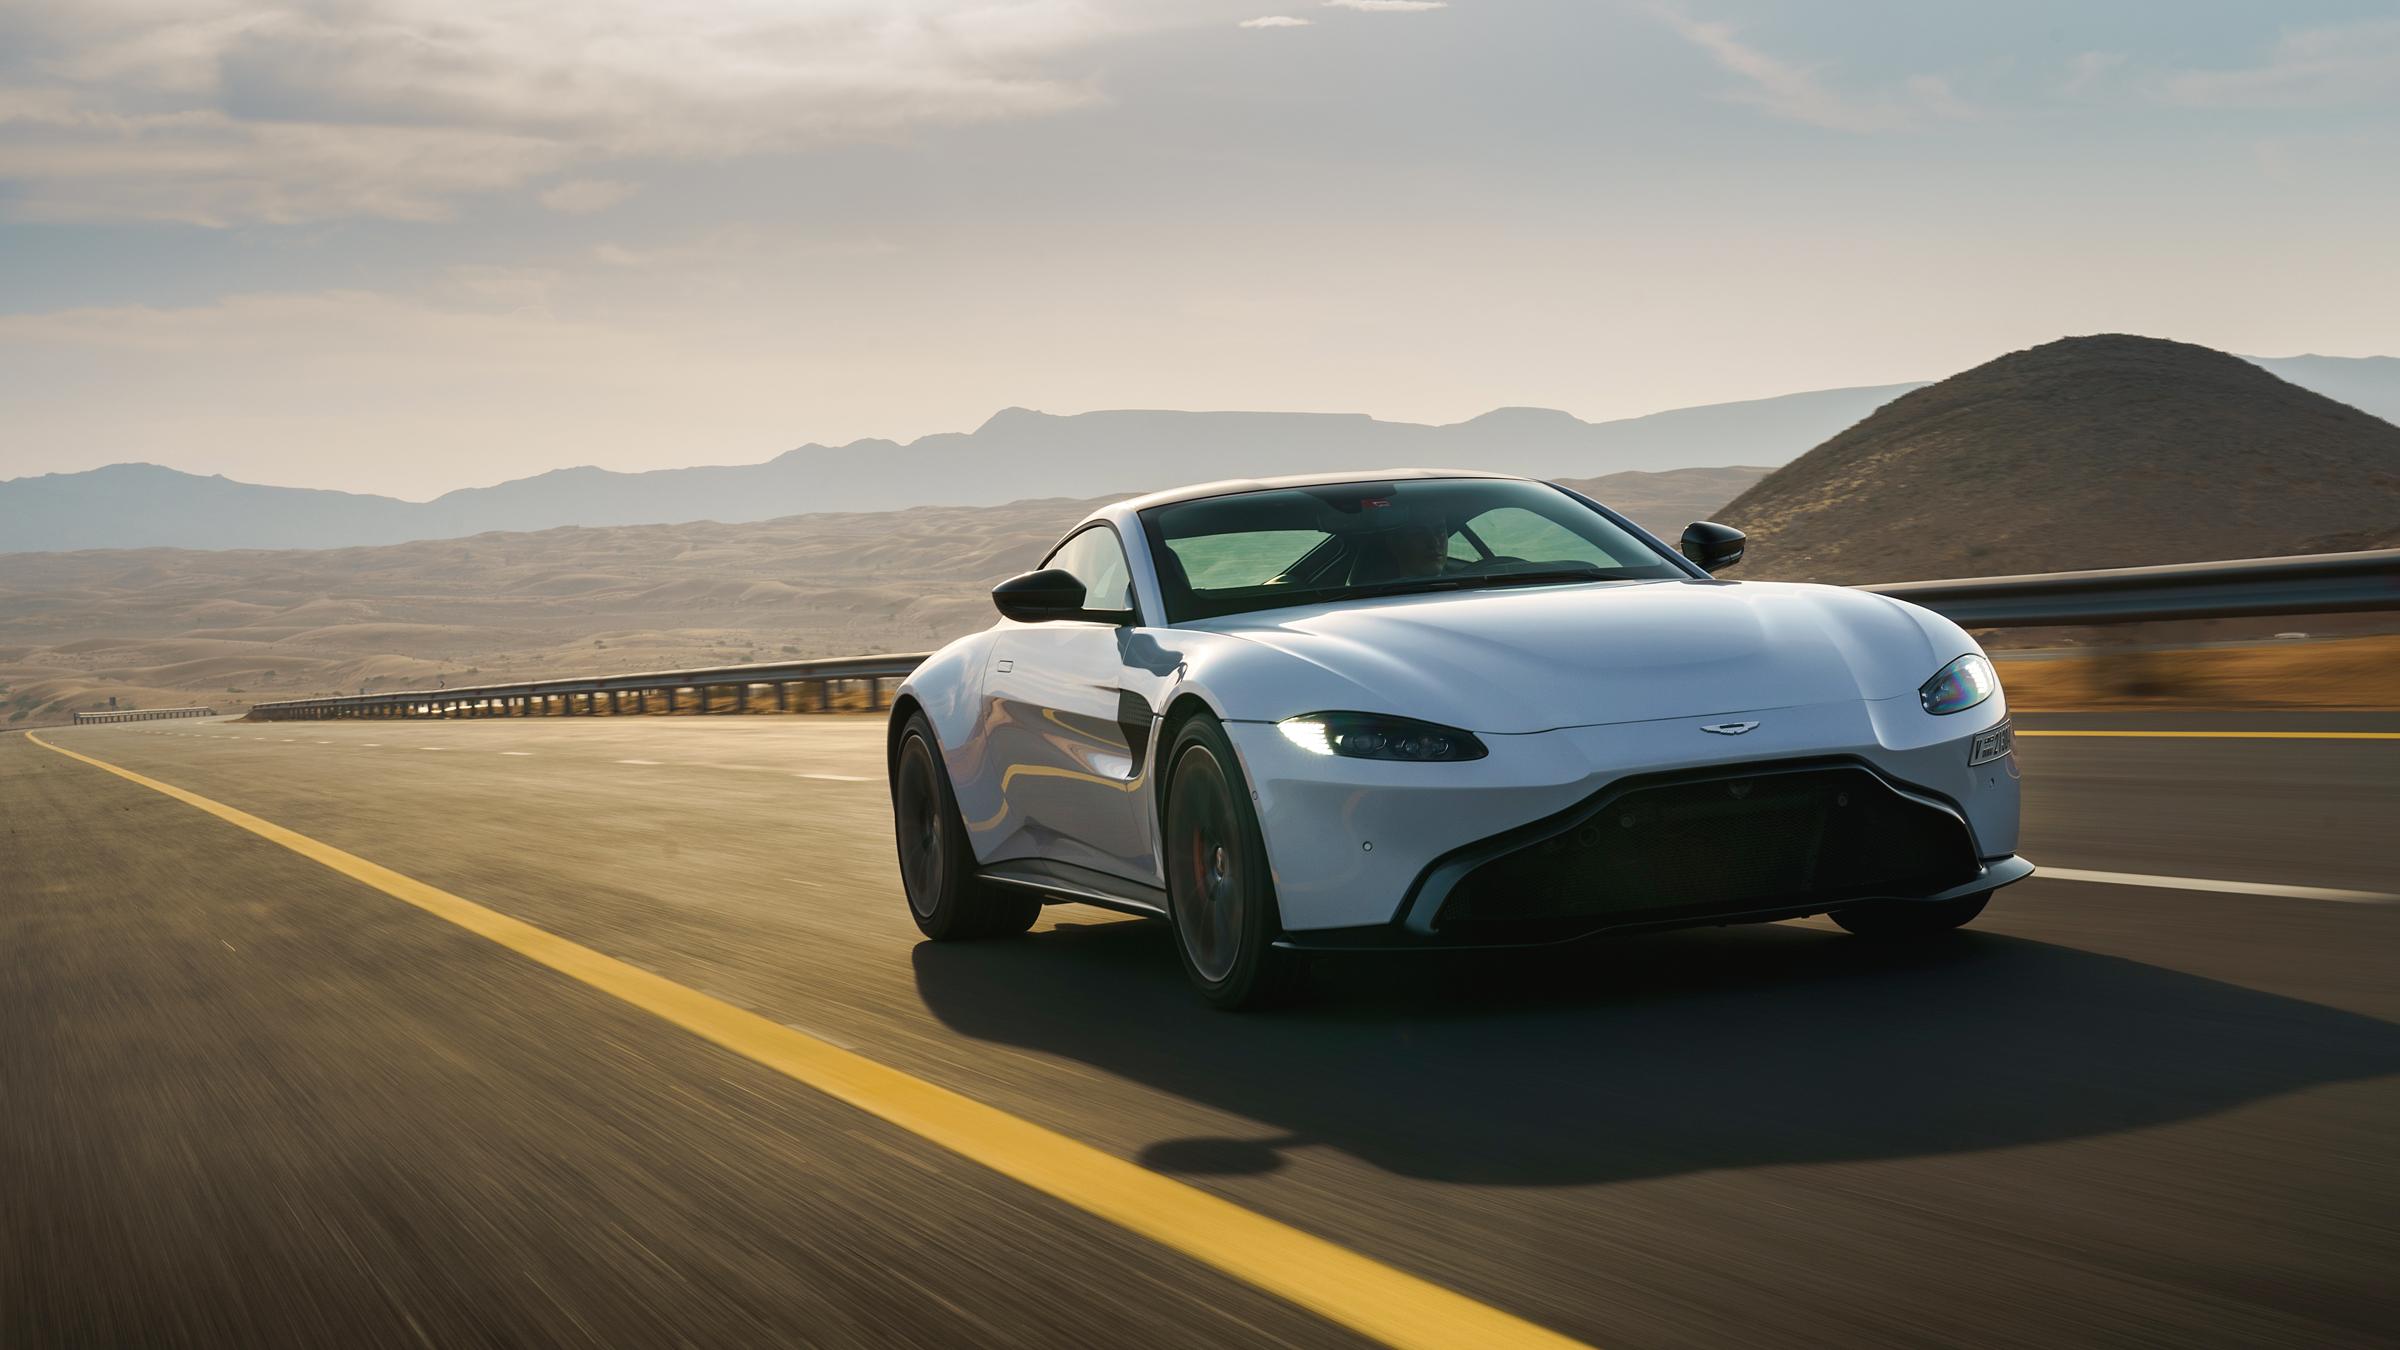 Aston Martin Cio Wannacry Pushed Us Into A Cyber Security Refresh